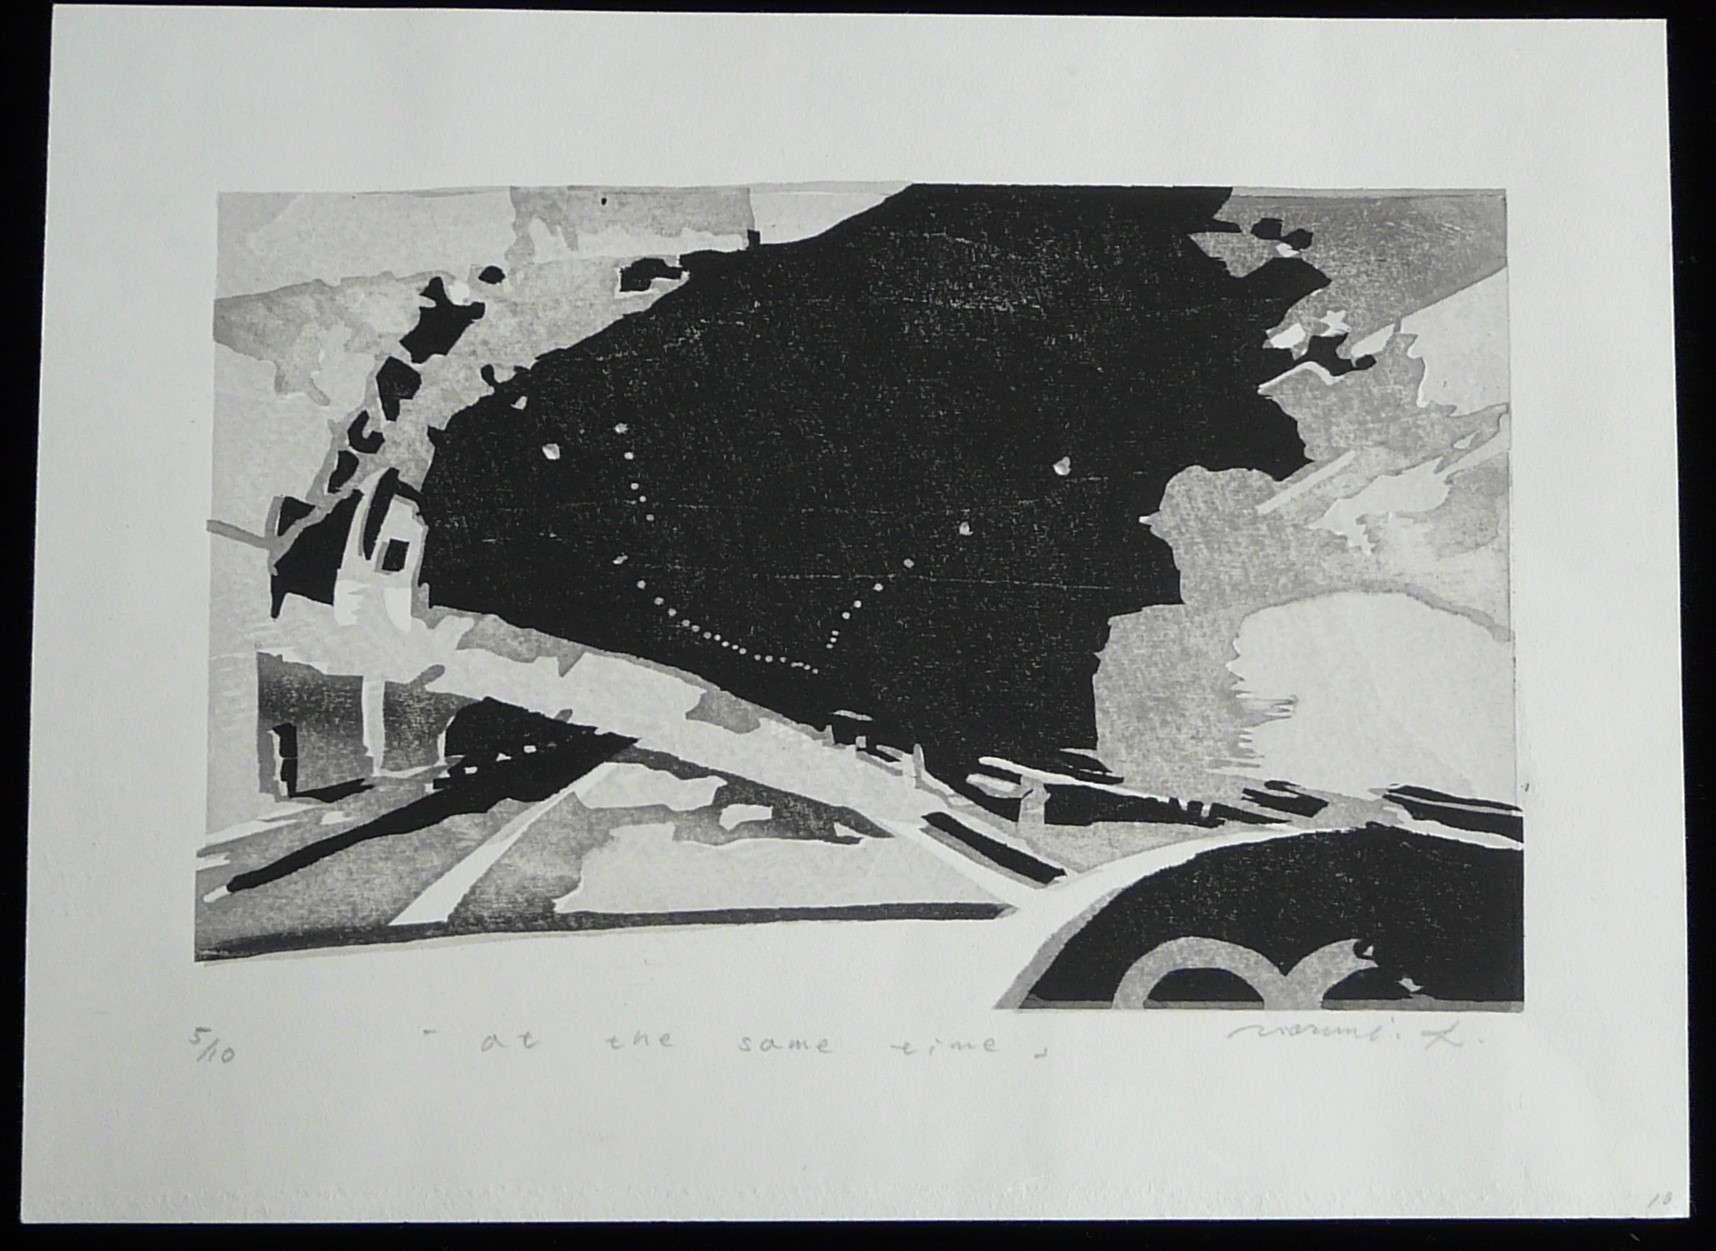 KATSURAGAWA, NARUMI: #P1987 AT THE SAME TIME